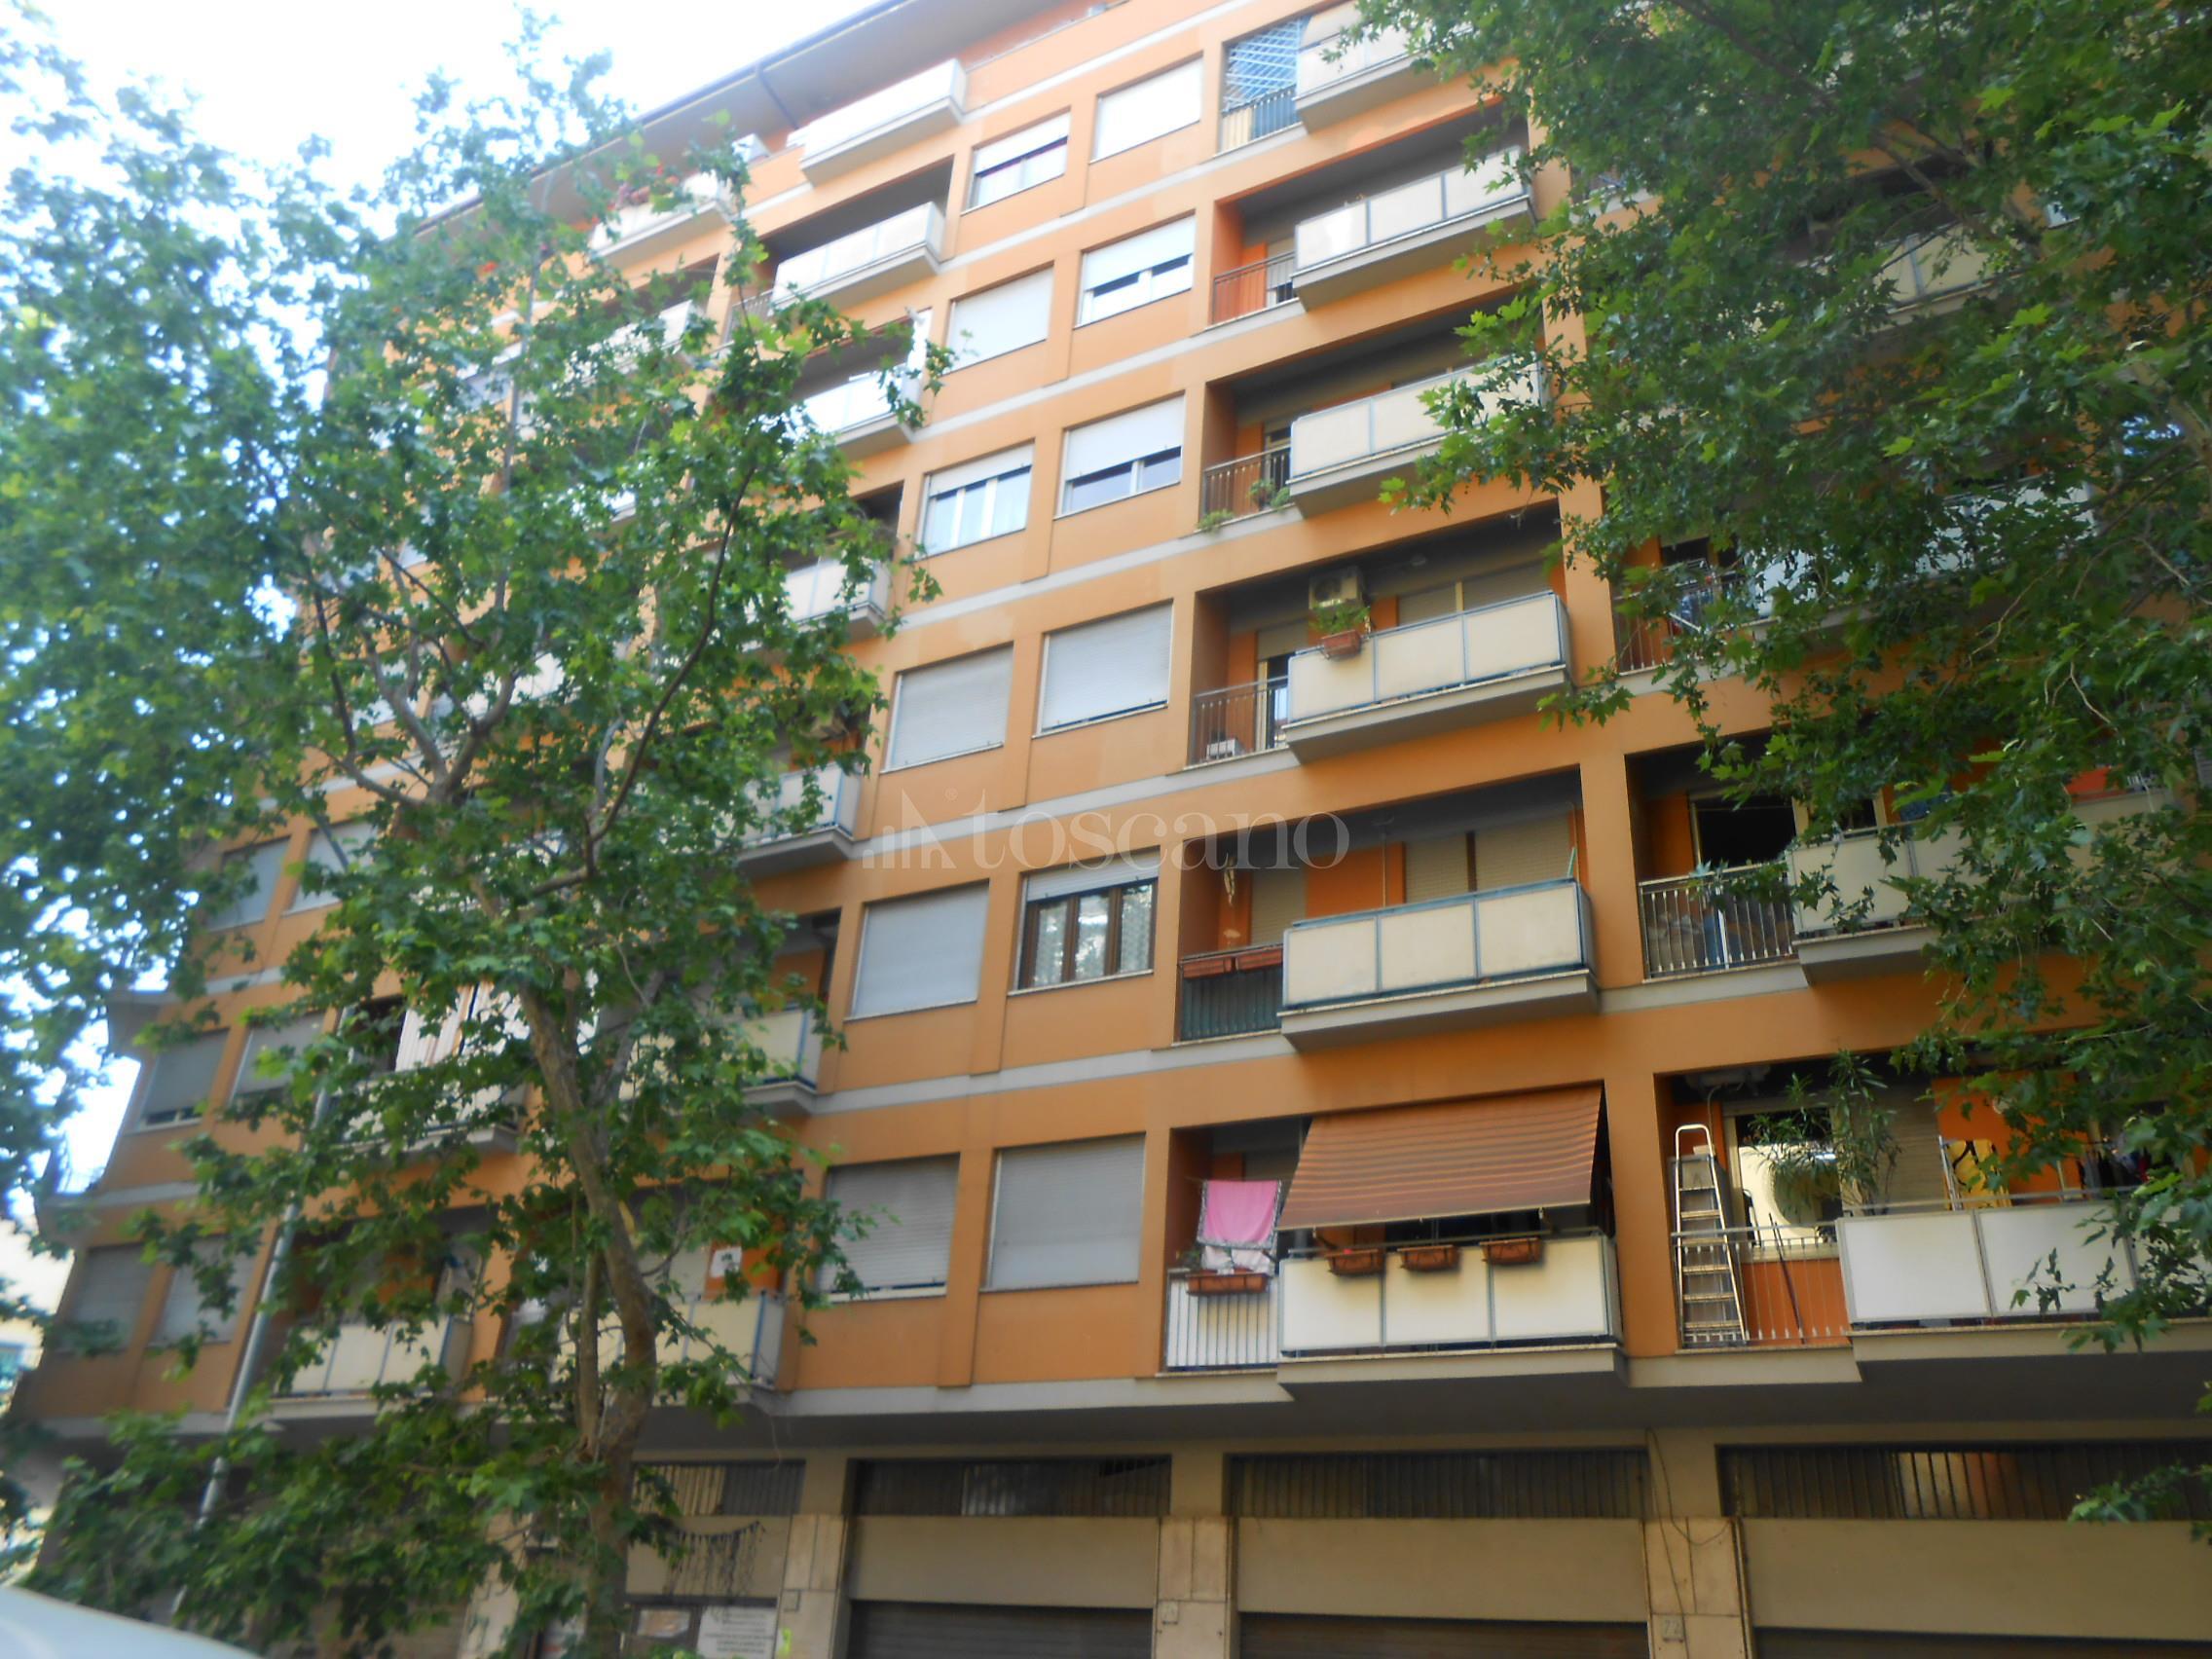 Vendita casa a roma in casalbertone casal bertone 62 2017 for Casa a roma vendita